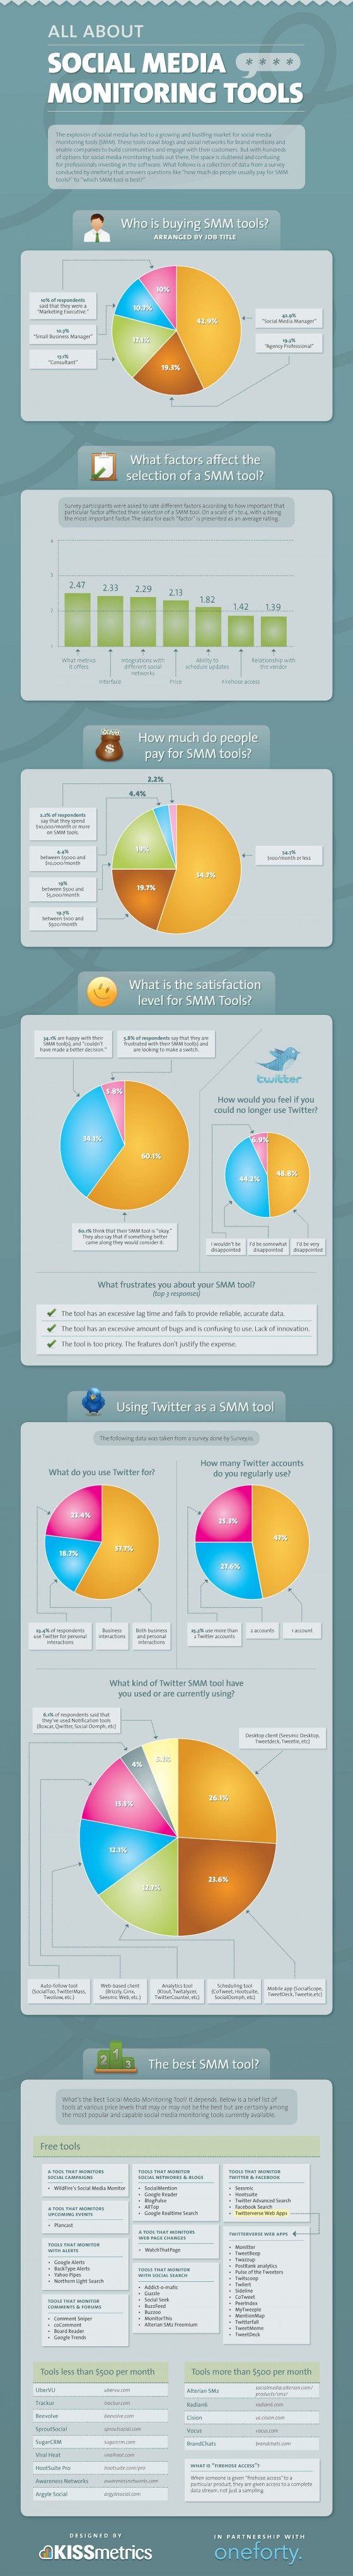 social media monitoring survey 560x4081 resized 600